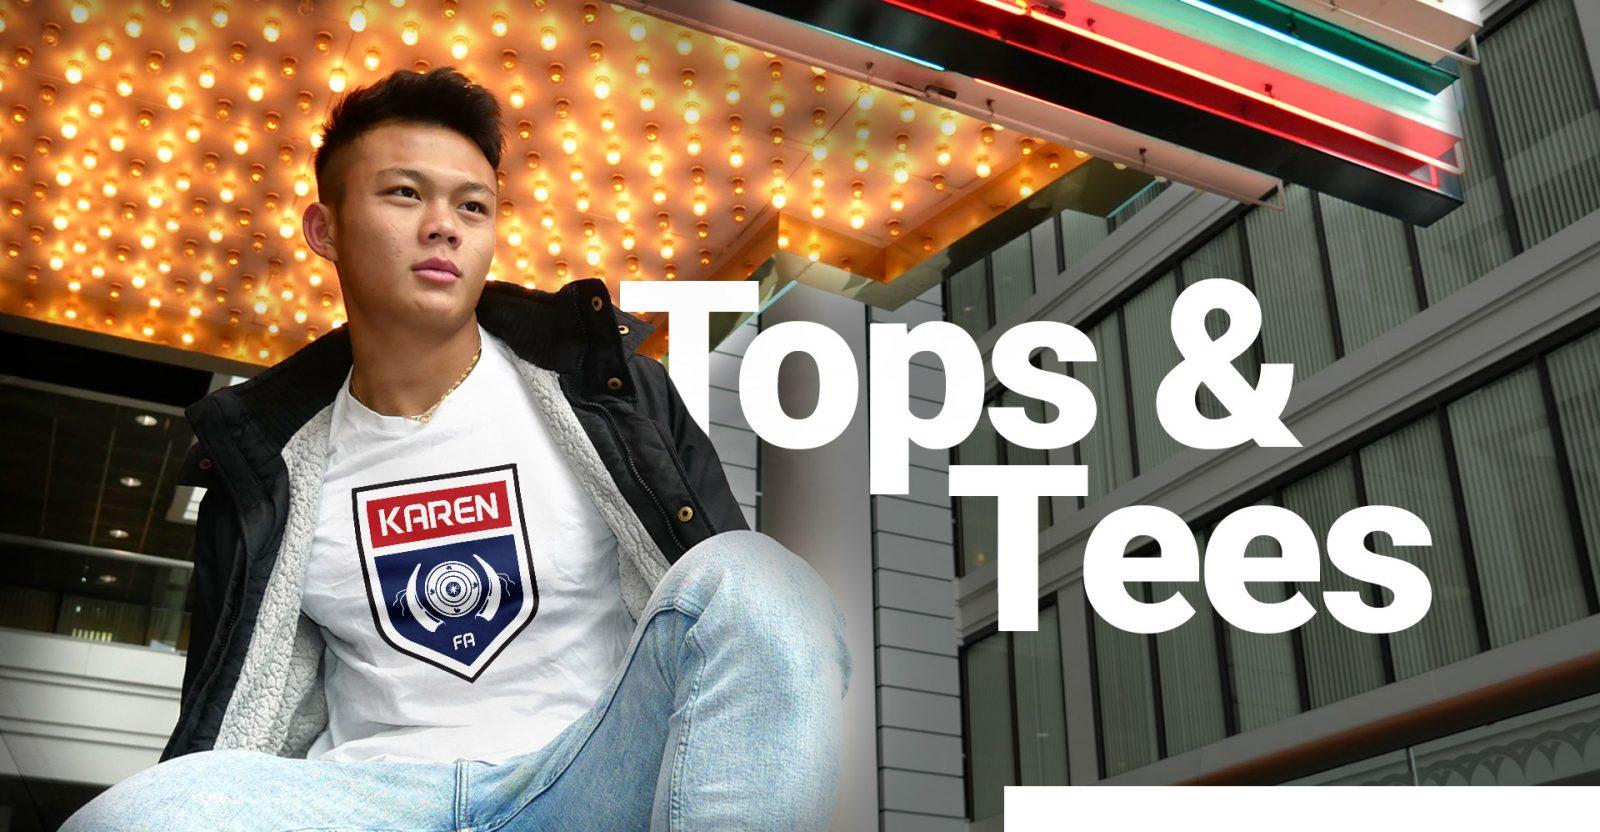 karen-national-team-full-image-header-desktop-mens-tops-tees